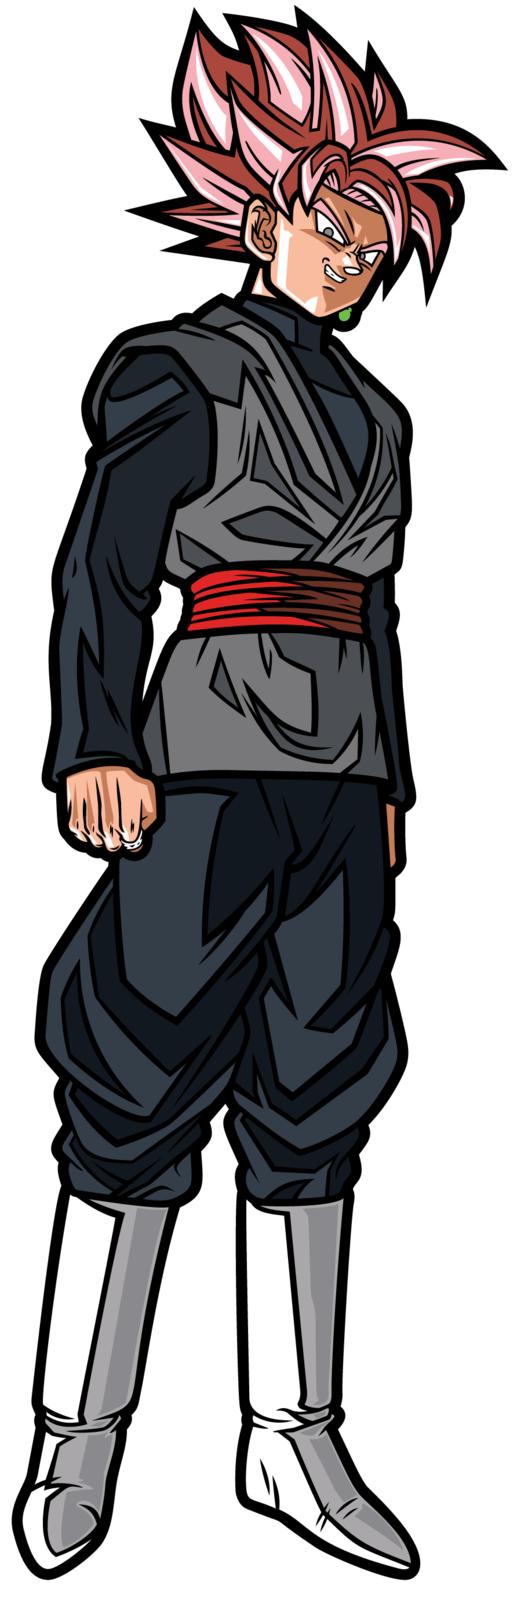 Dragon Ball Super: SS Rose Goku Black (#) - Collectors FiGPiN image